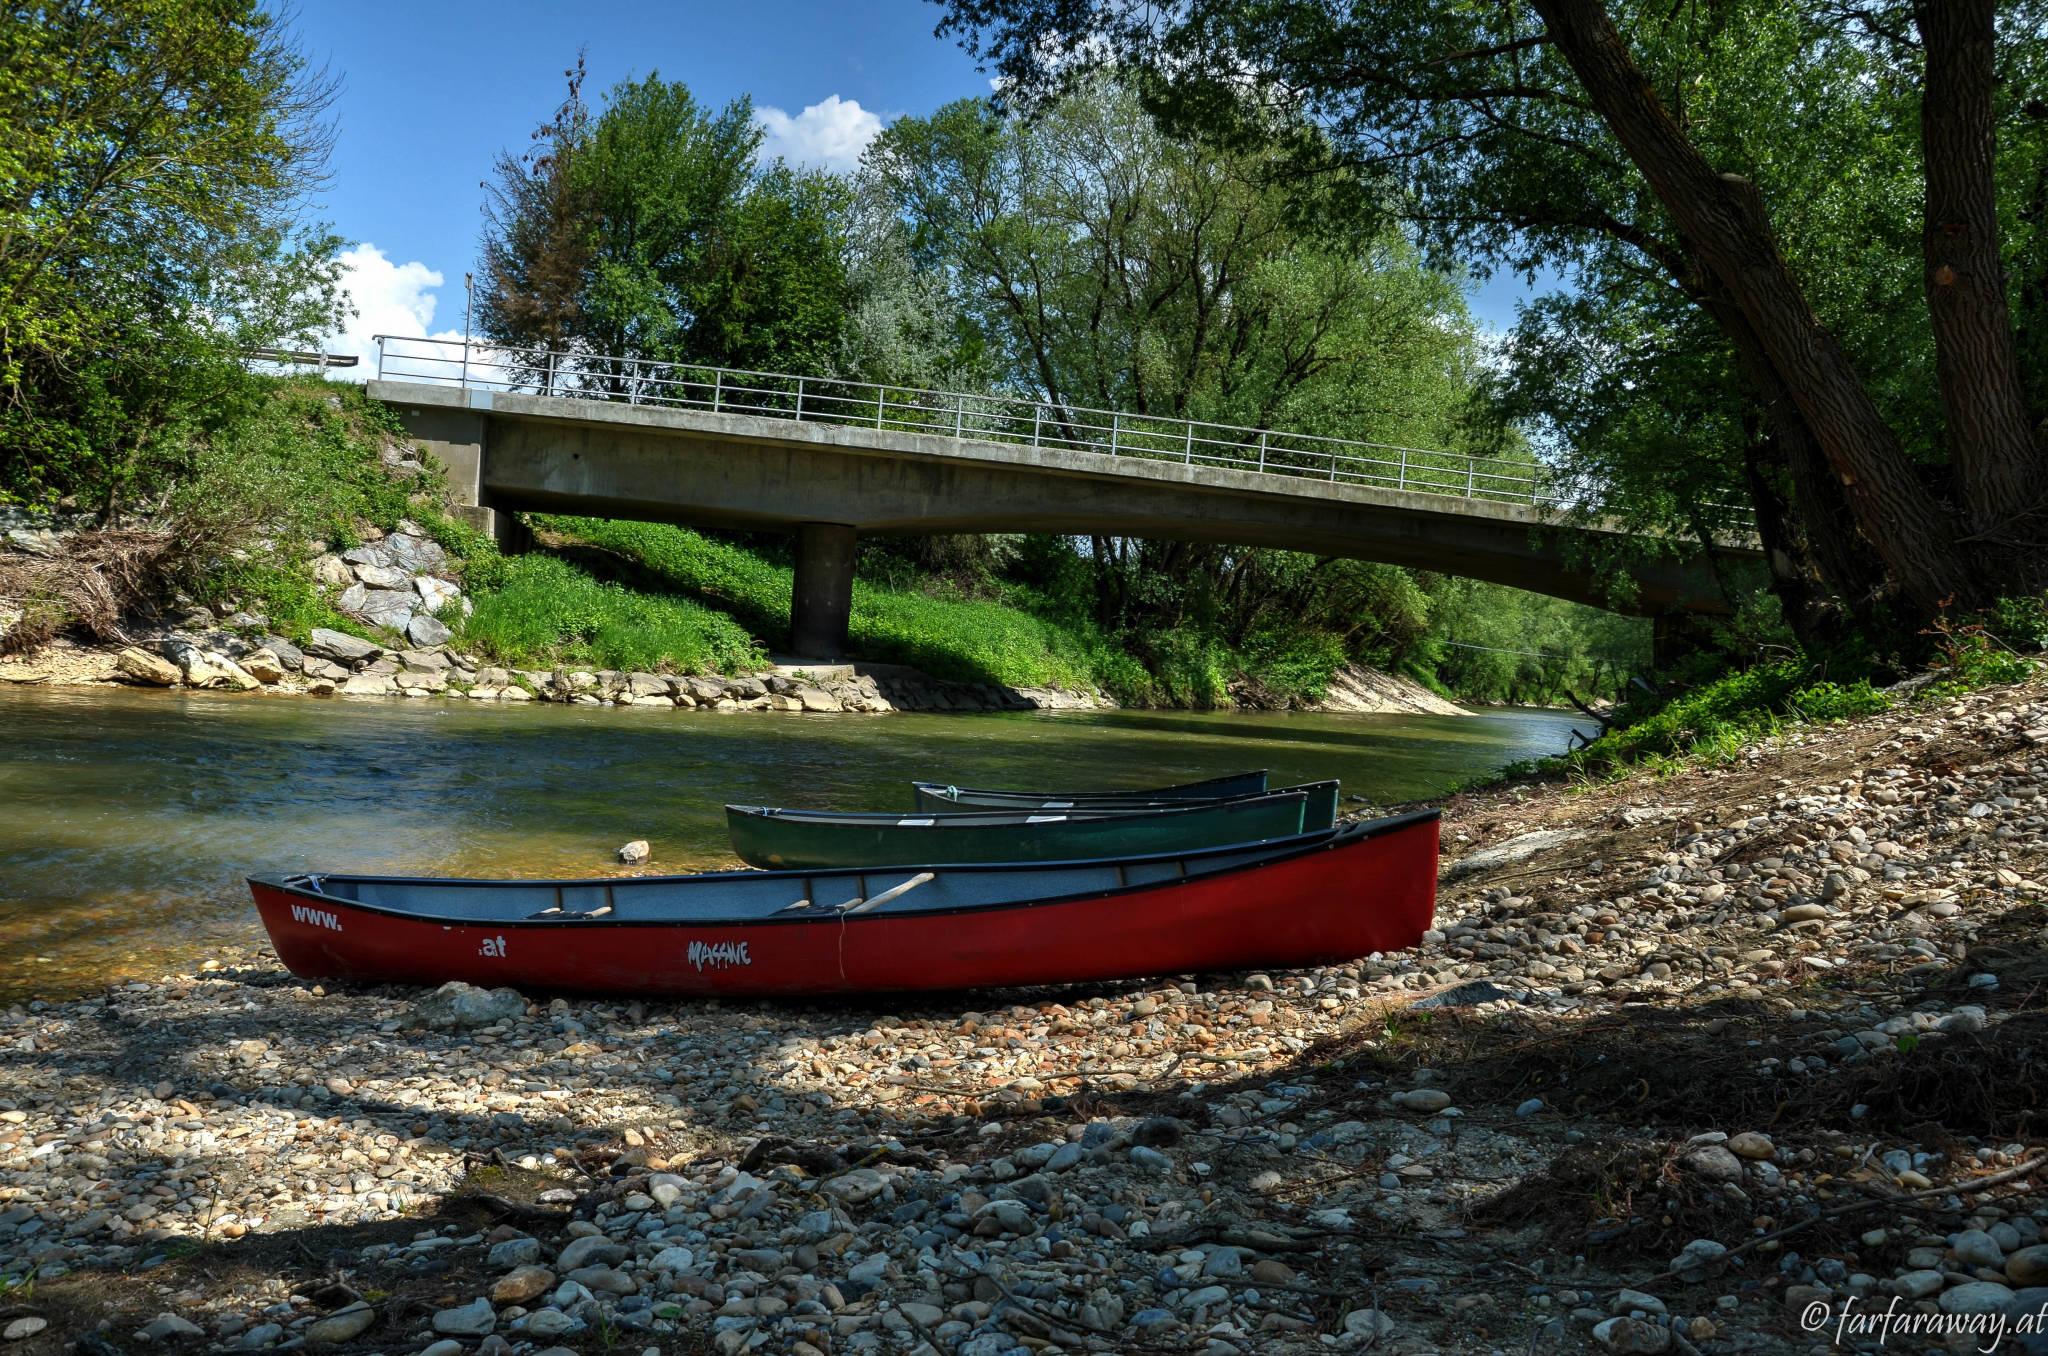 Kanus an der Raab